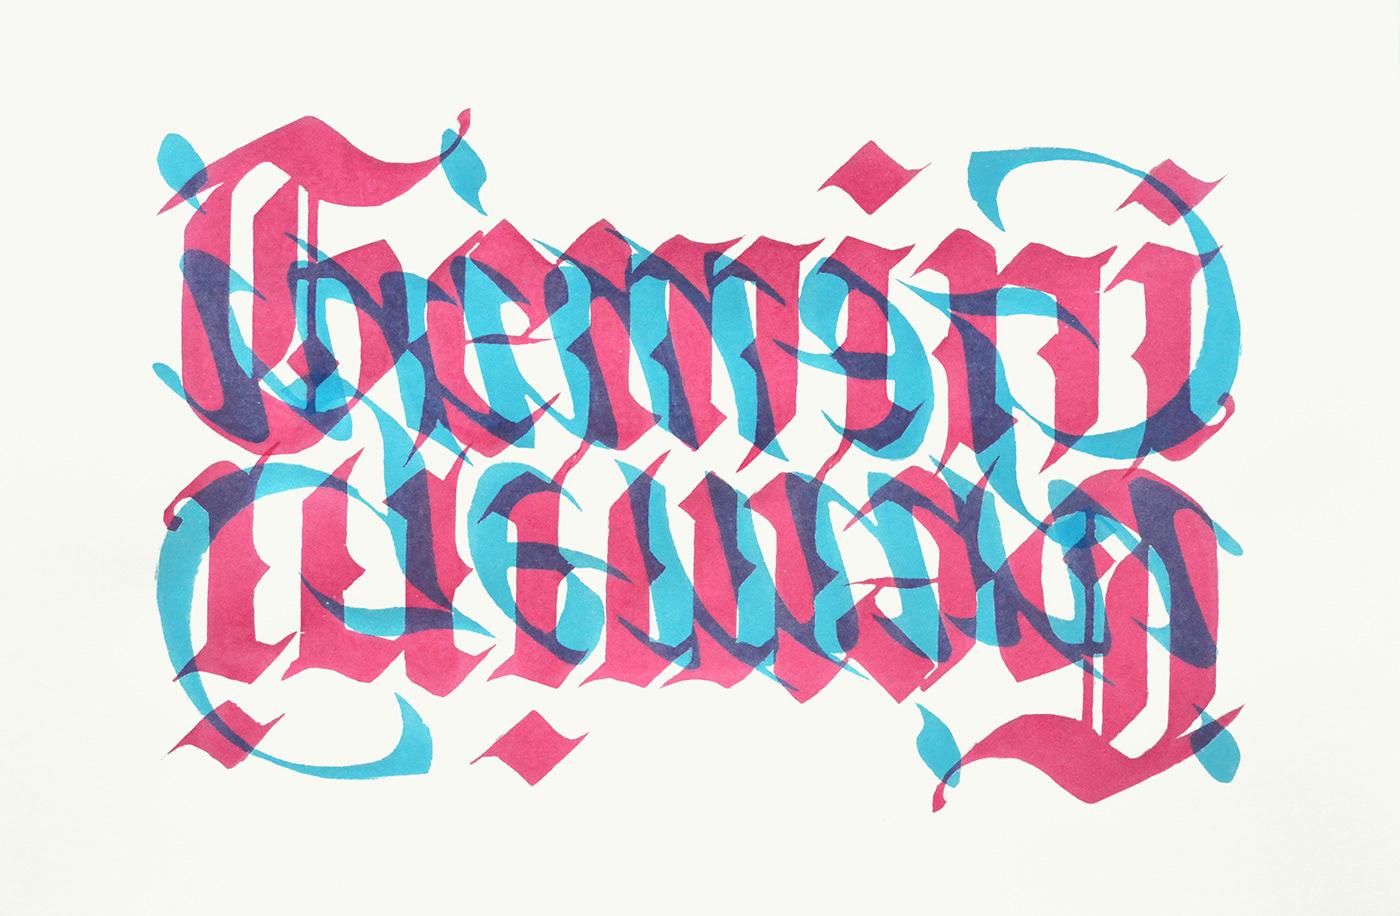 Image may contain: drawing and abstract